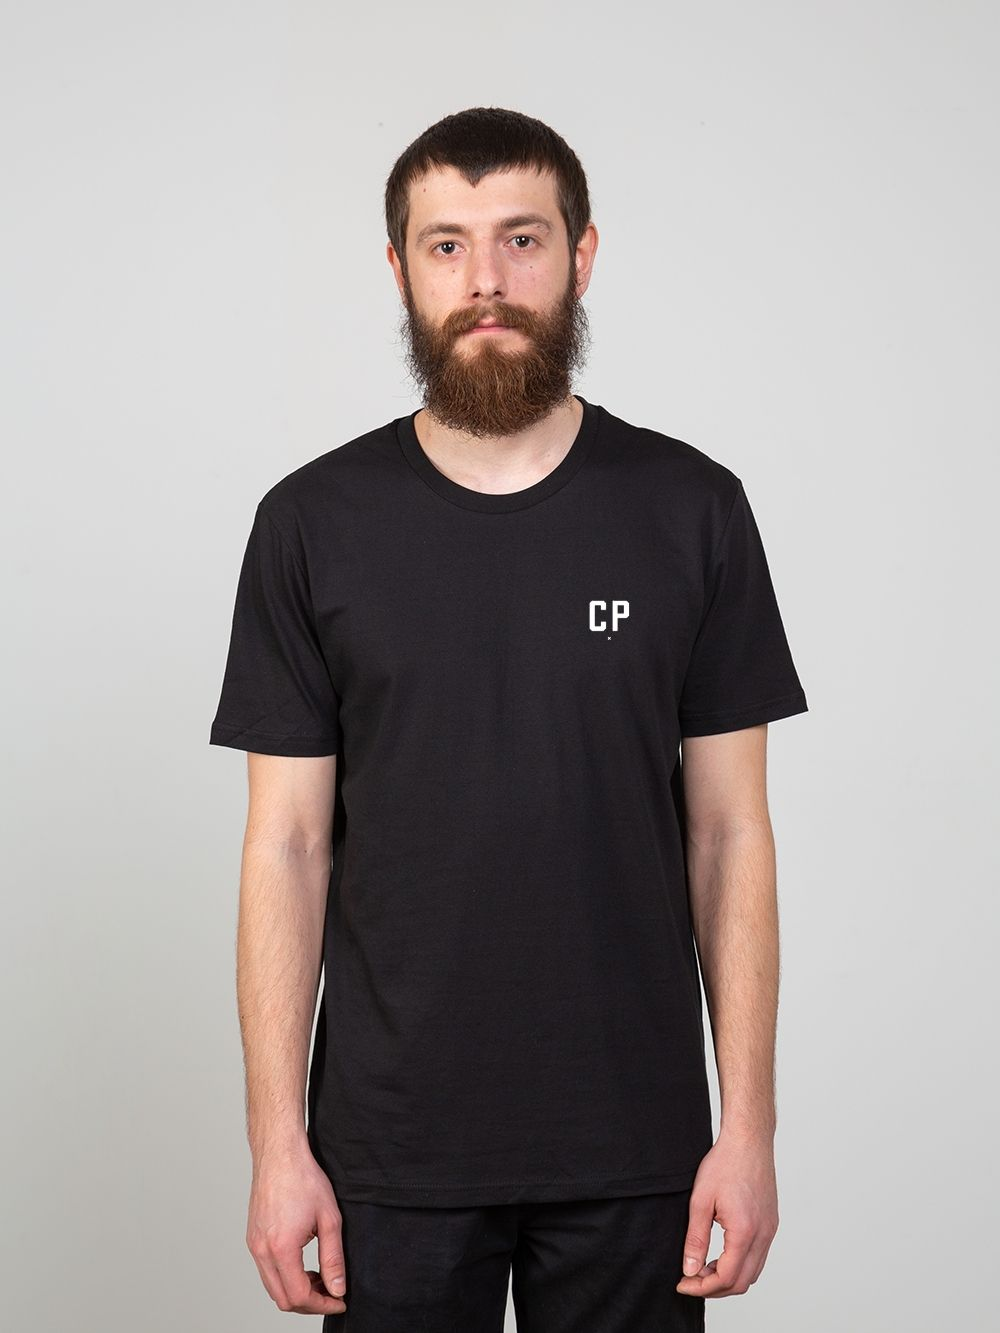 CP Decent